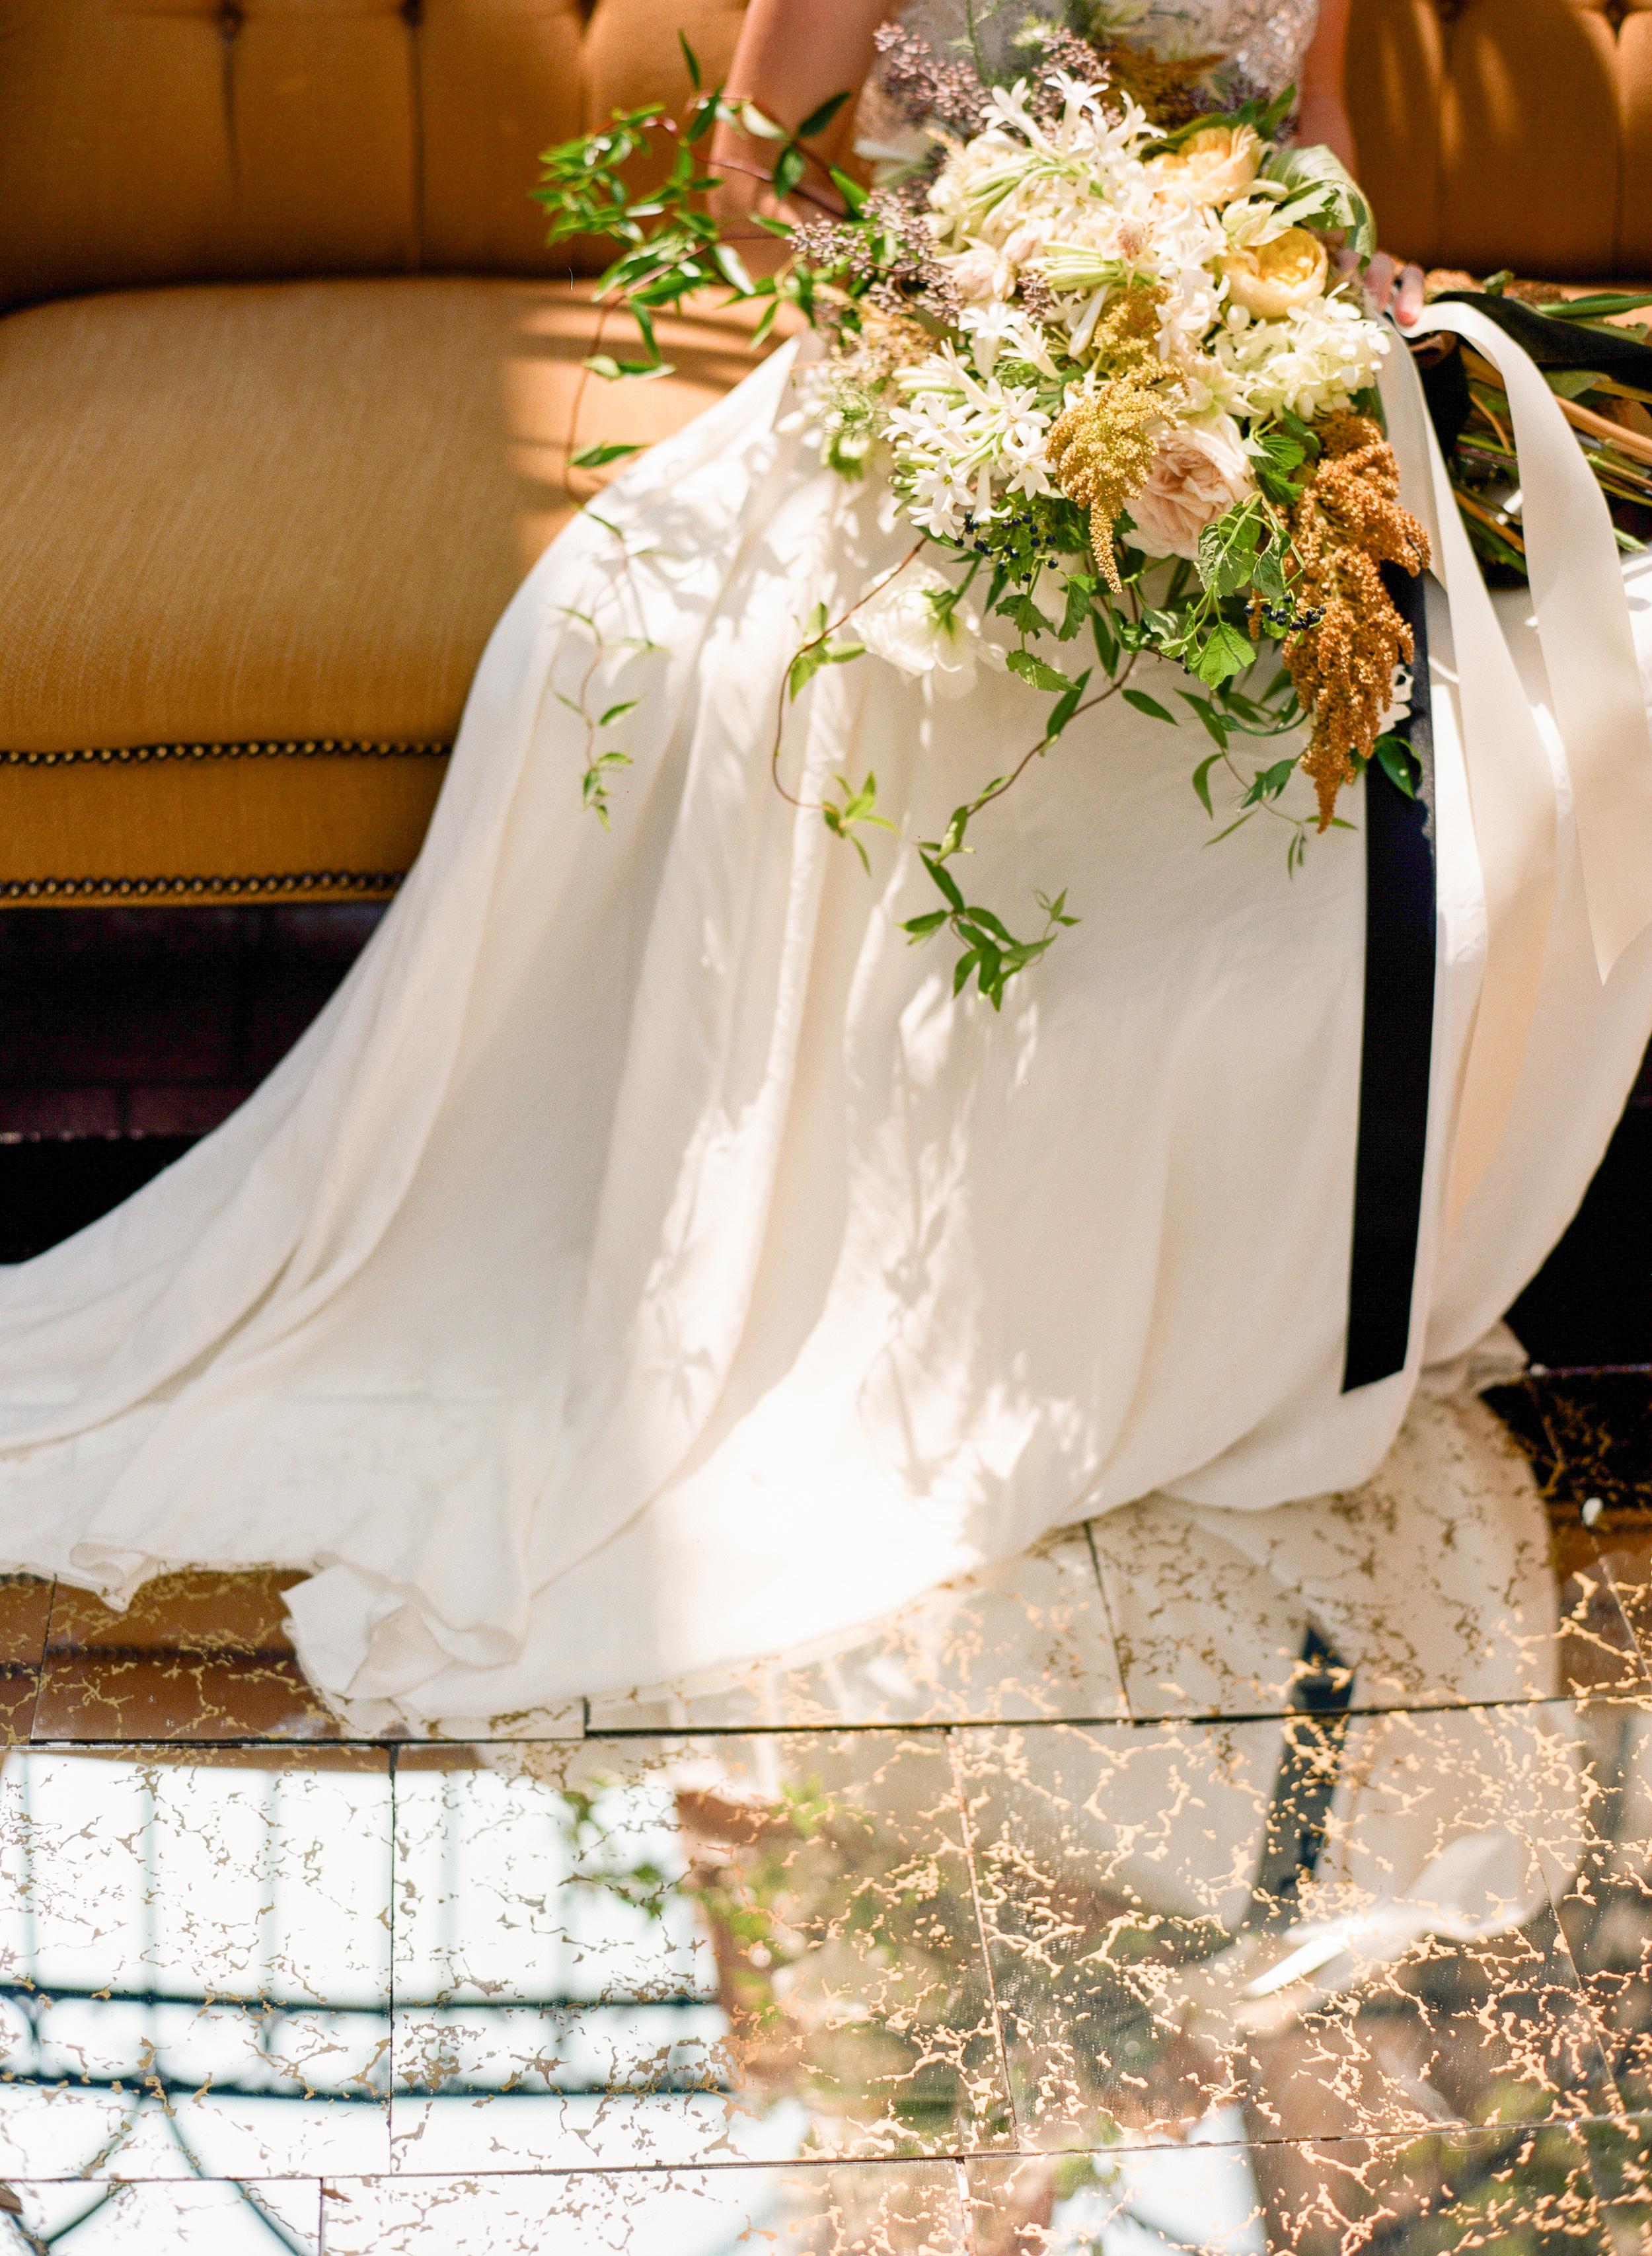 Olivia-Griffin-trendy-bride-magazine-willow-florals-sarah-seven-gwen-ivory-and-beau-bridal-boutique-savannah-wedding-dresses-savannah-bridal-boutique-savannah-wedding-savannah-bridal-gowns-savannah-wedding-planner-georgia-bridal-boutique-14.JPG